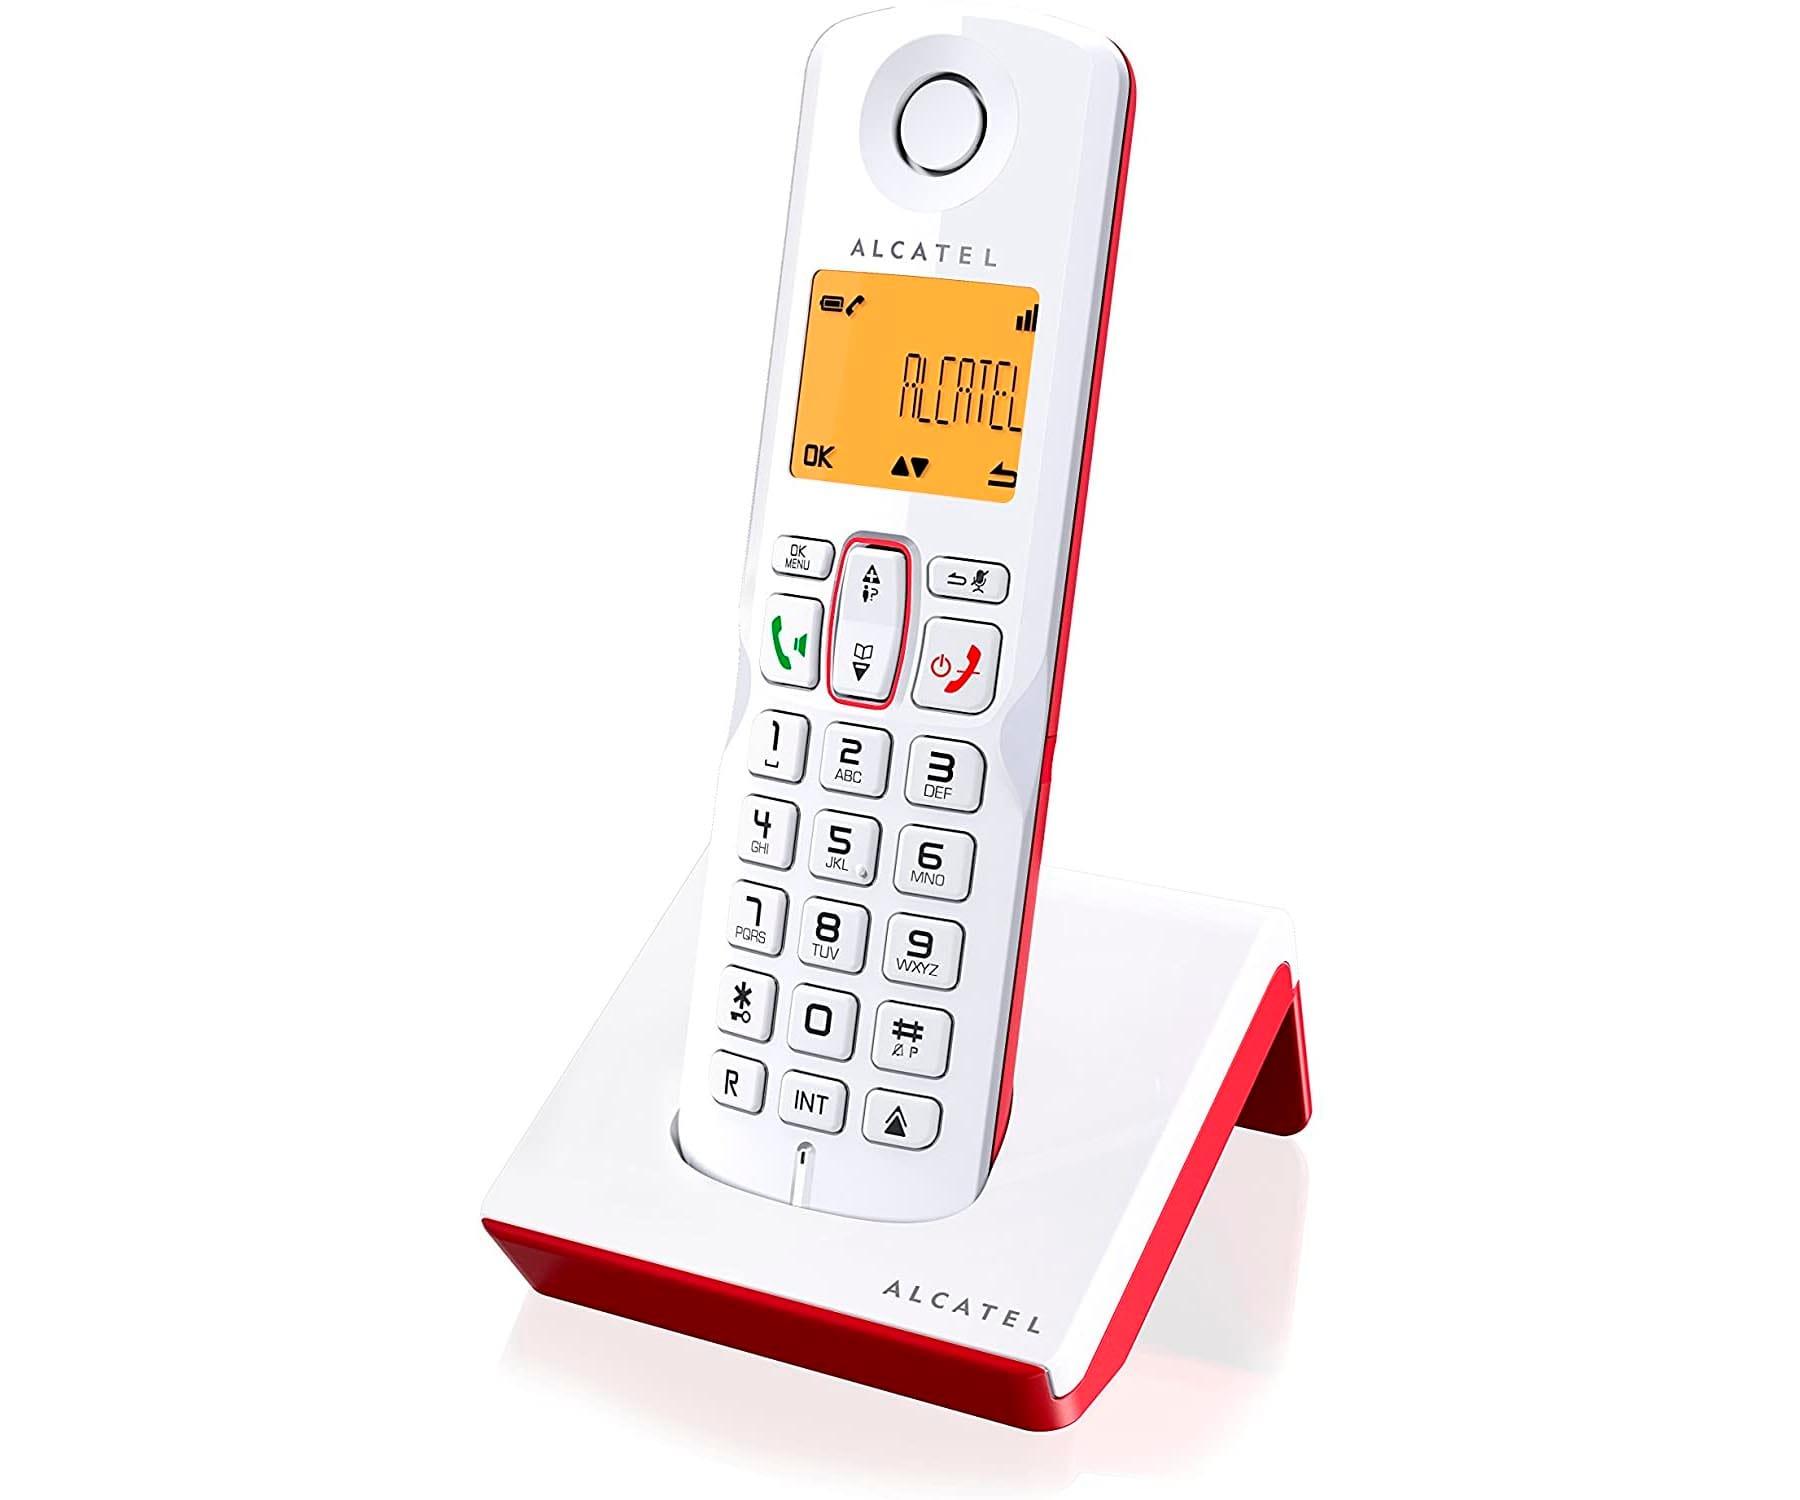 ALCATEL S250 BLANCO/ROJO TELÉFONO FIJO INALÁMBRICO PANTALLA RETROILUMINADA BLOQUEO DE LLAMADAS